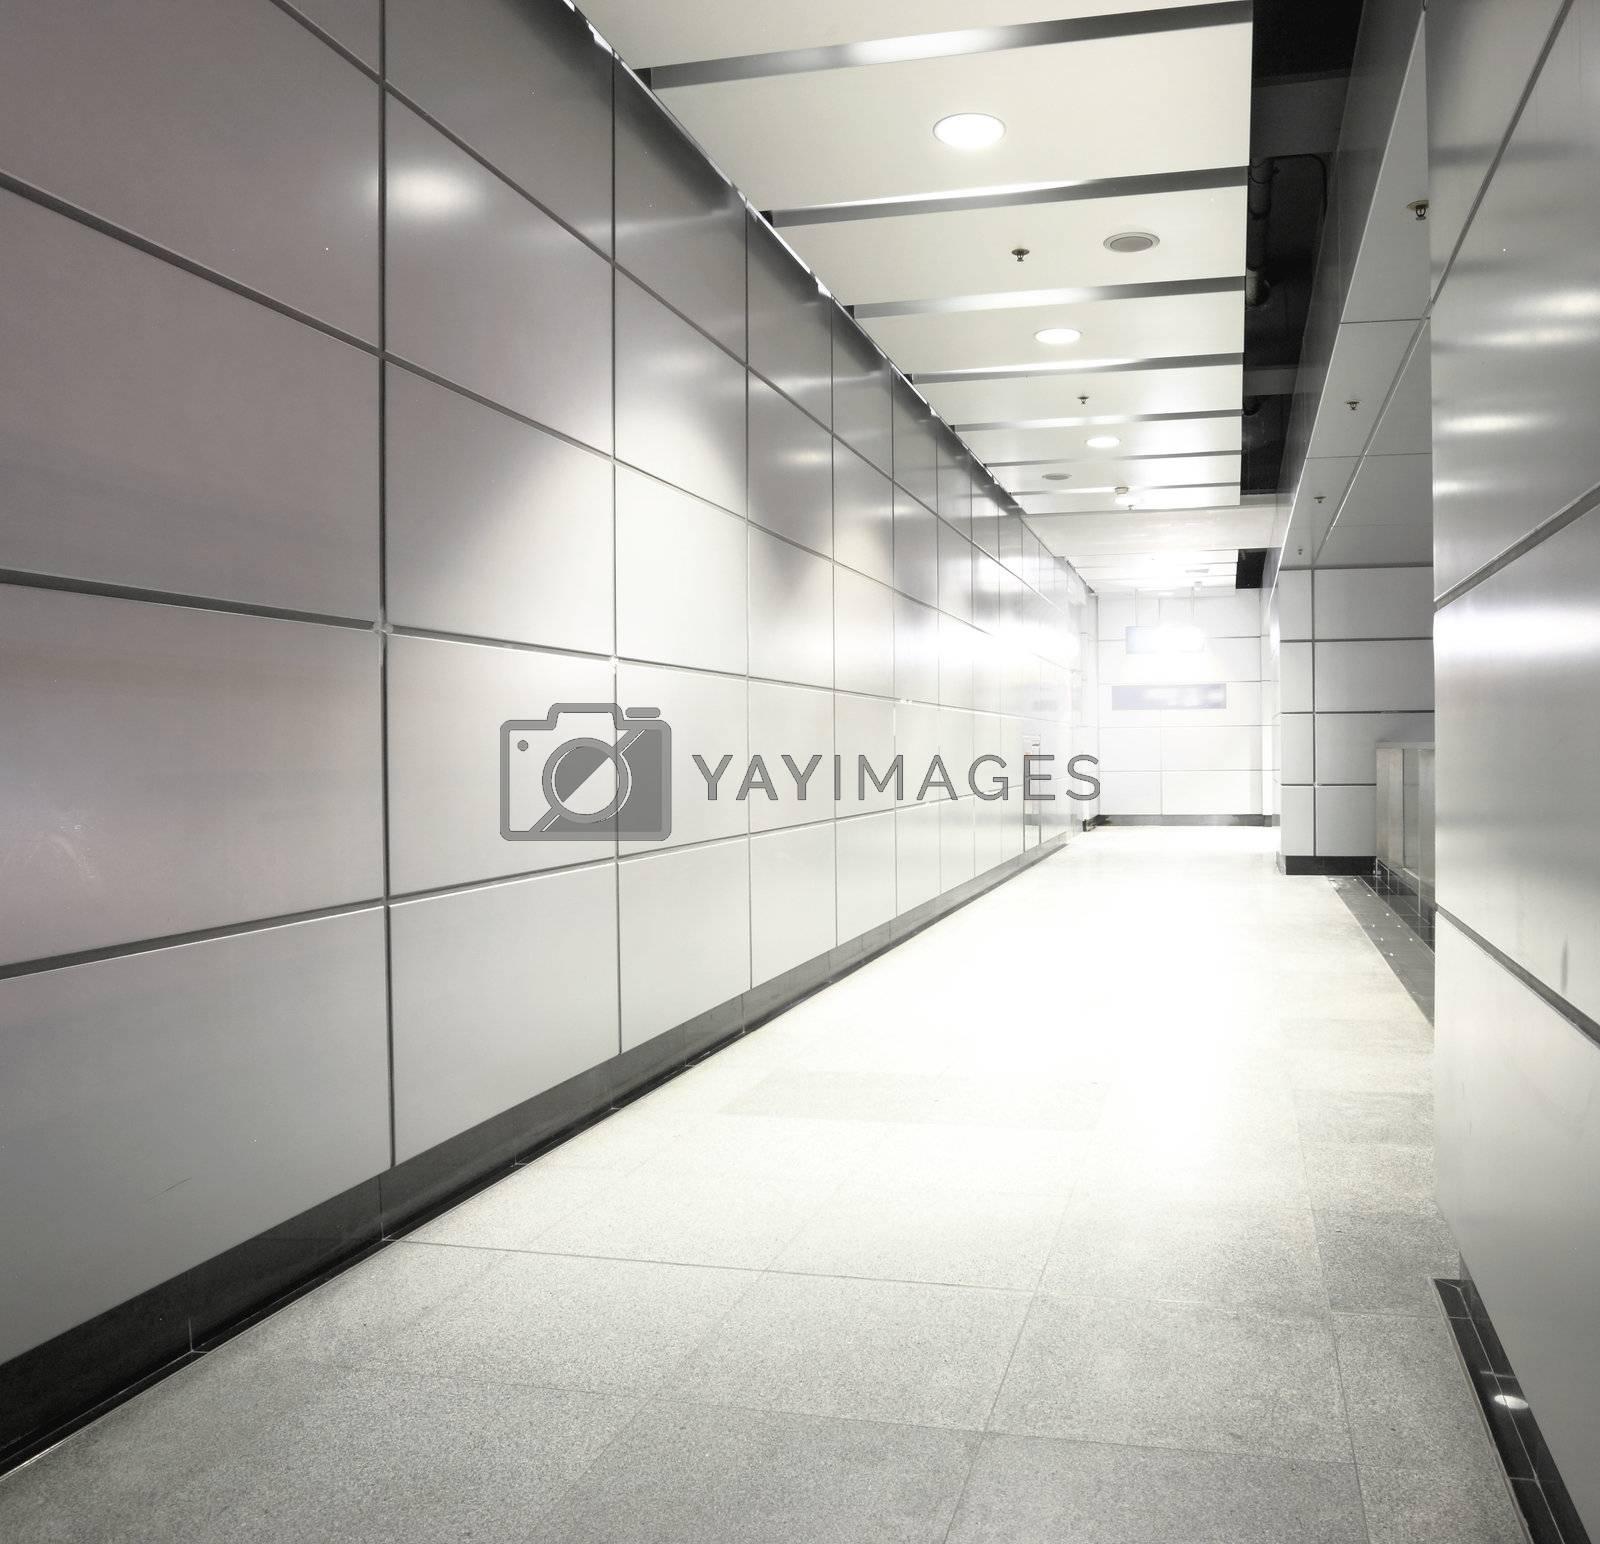 Royalty free image of modern corridor by leungchopan